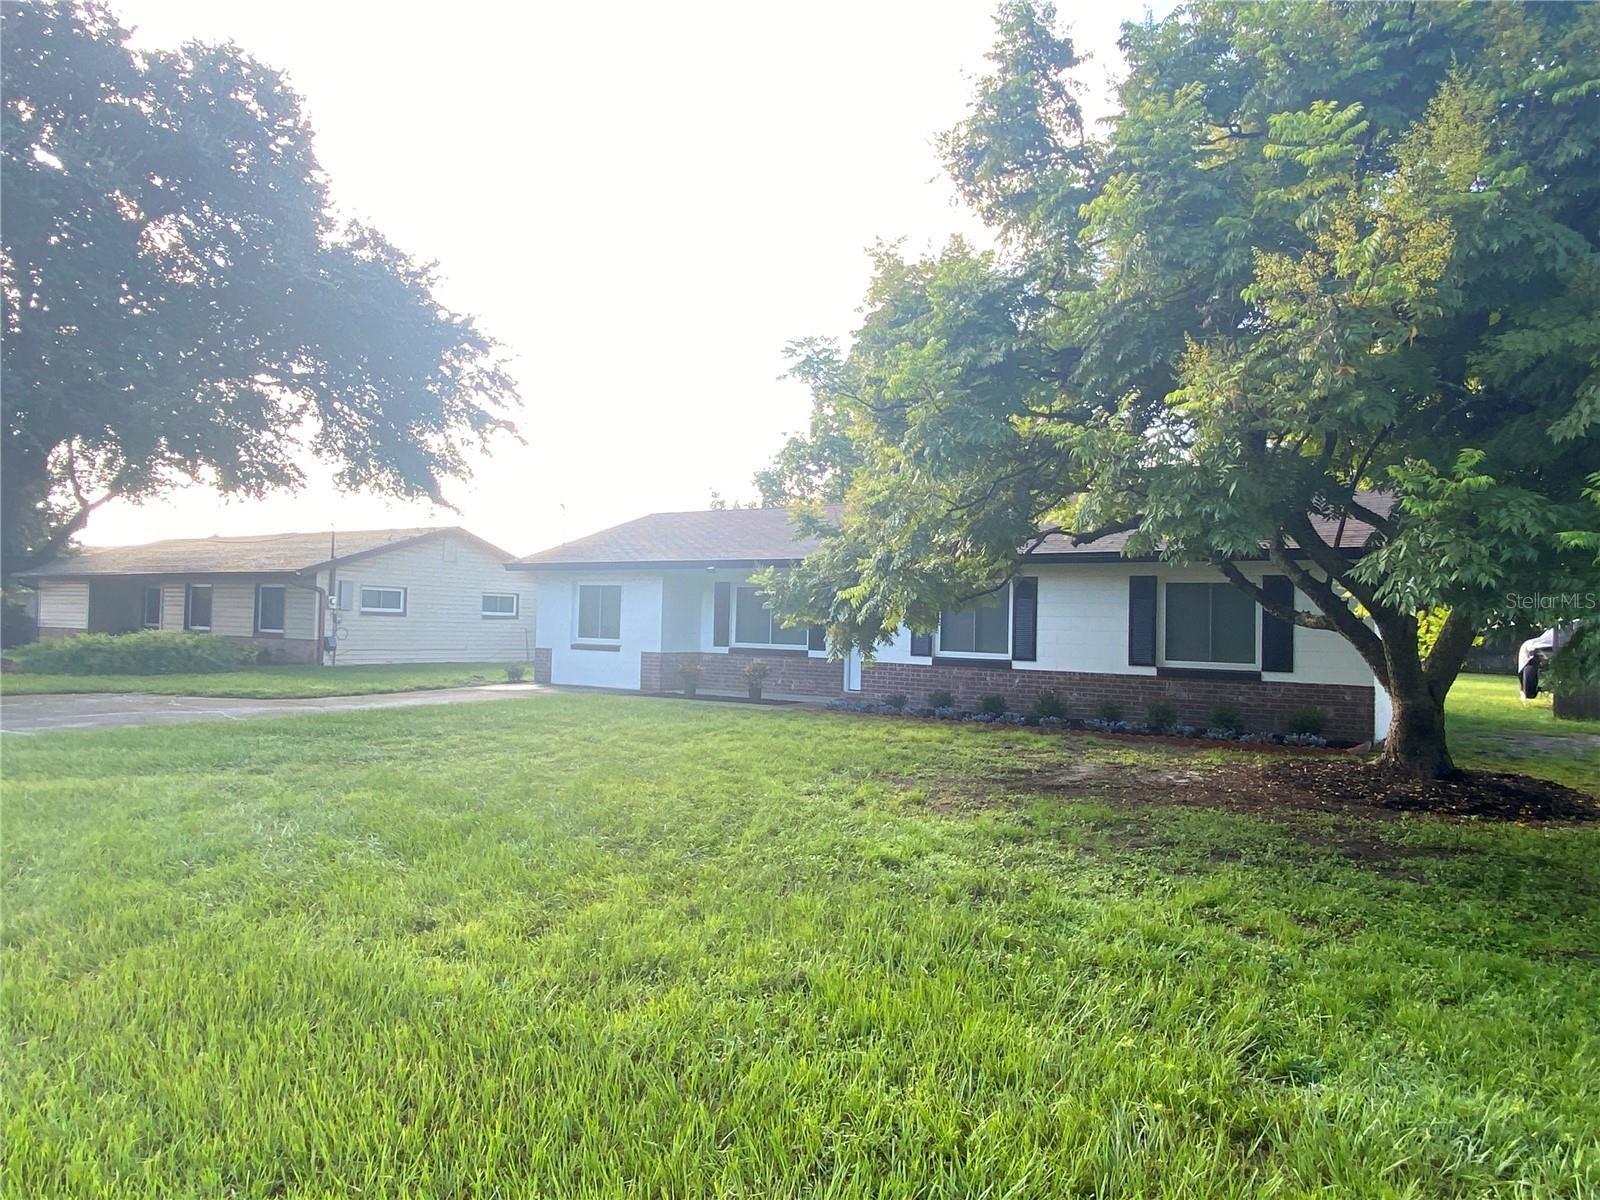 Photo of 480 E PLANT ST, WINTER GARDEN, FL 34787 (MLS # G5047057)